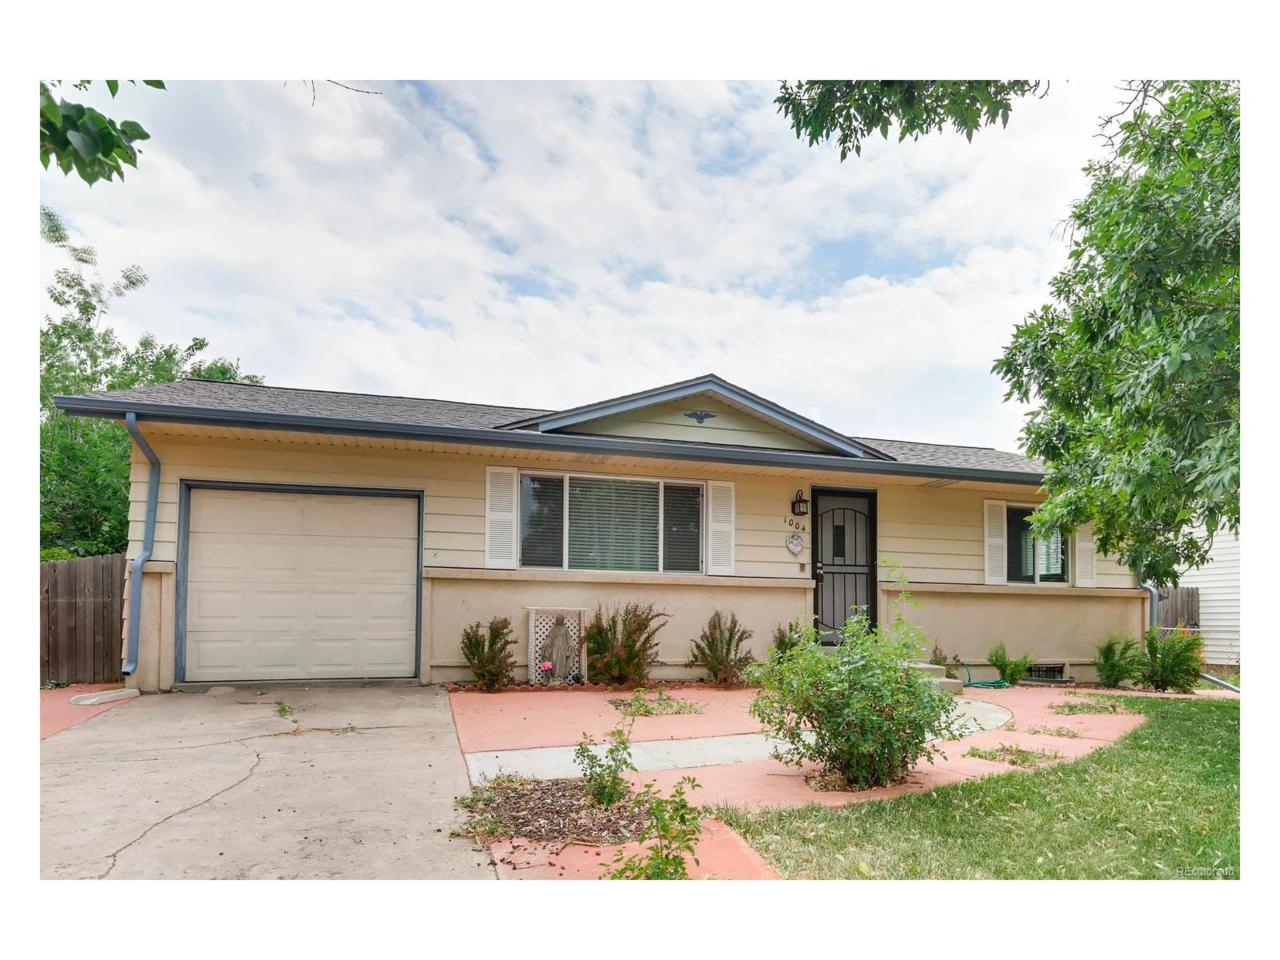 1004 Ouray Street, Aurora, CO 80011 (MLS #7672508) :: 8z Real Estate